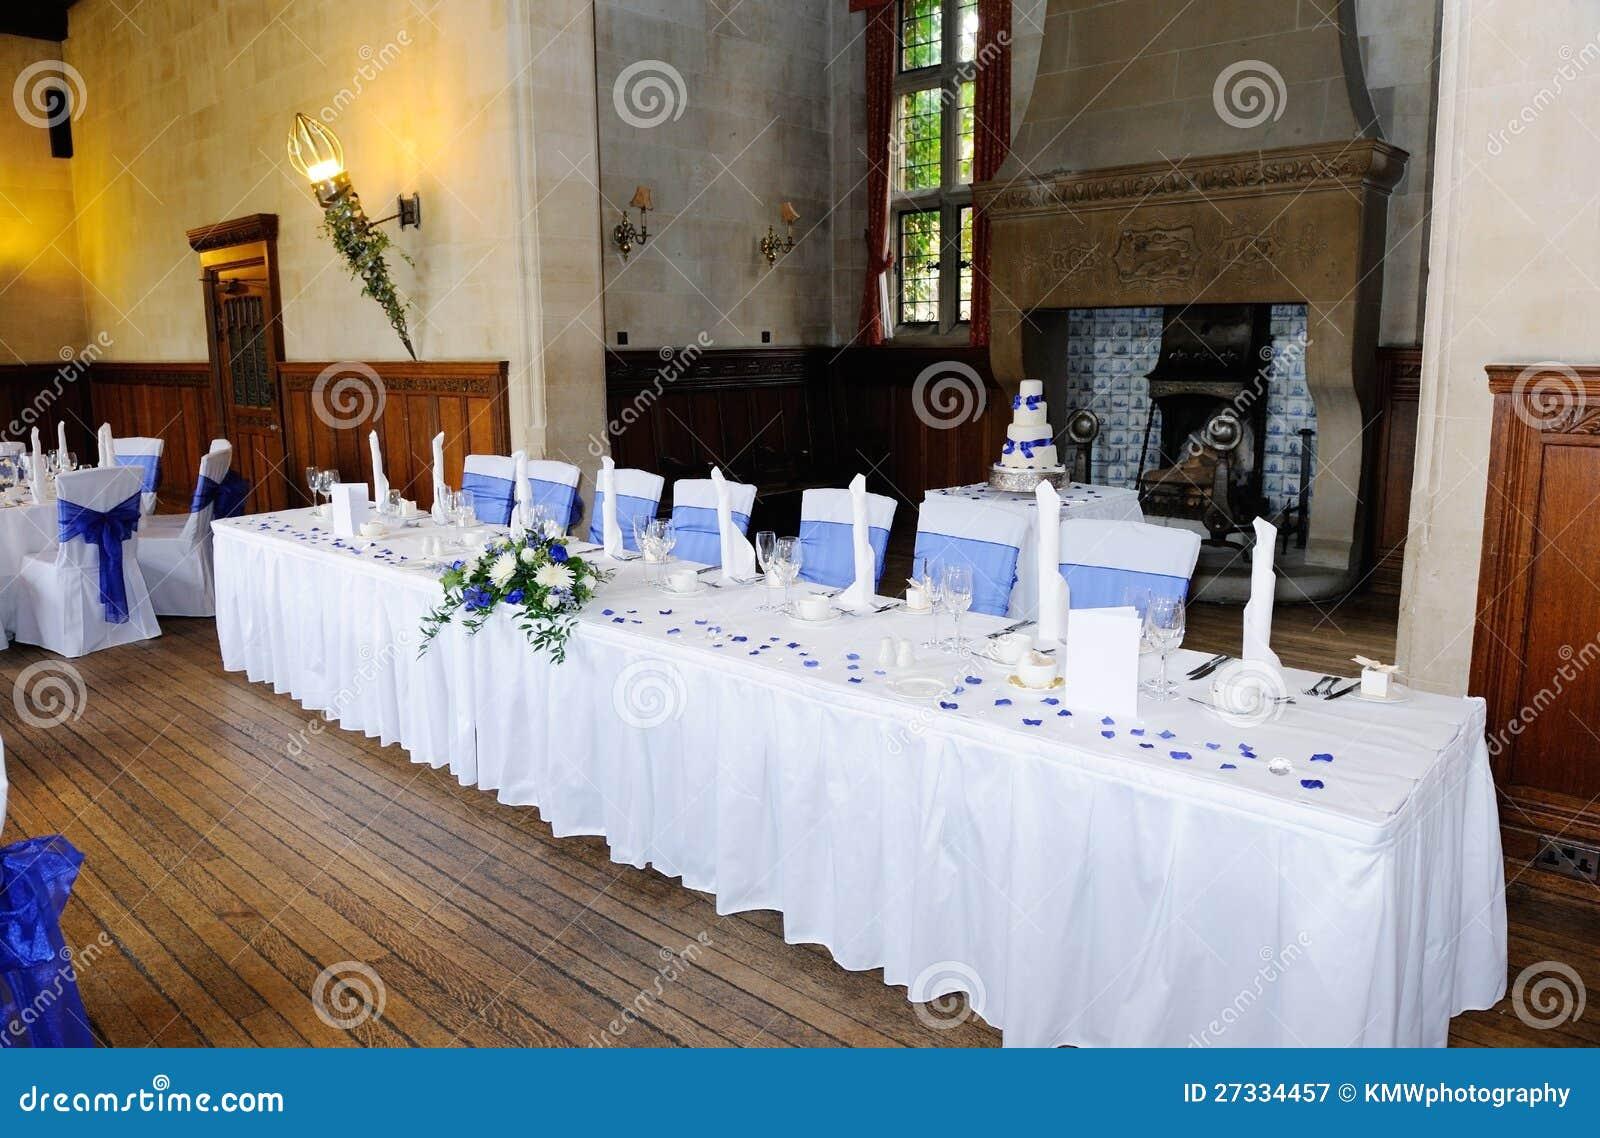 Head Table Decorations Wedding Reception Wedding Dress: Head Table At Wedding Reception Stock Image